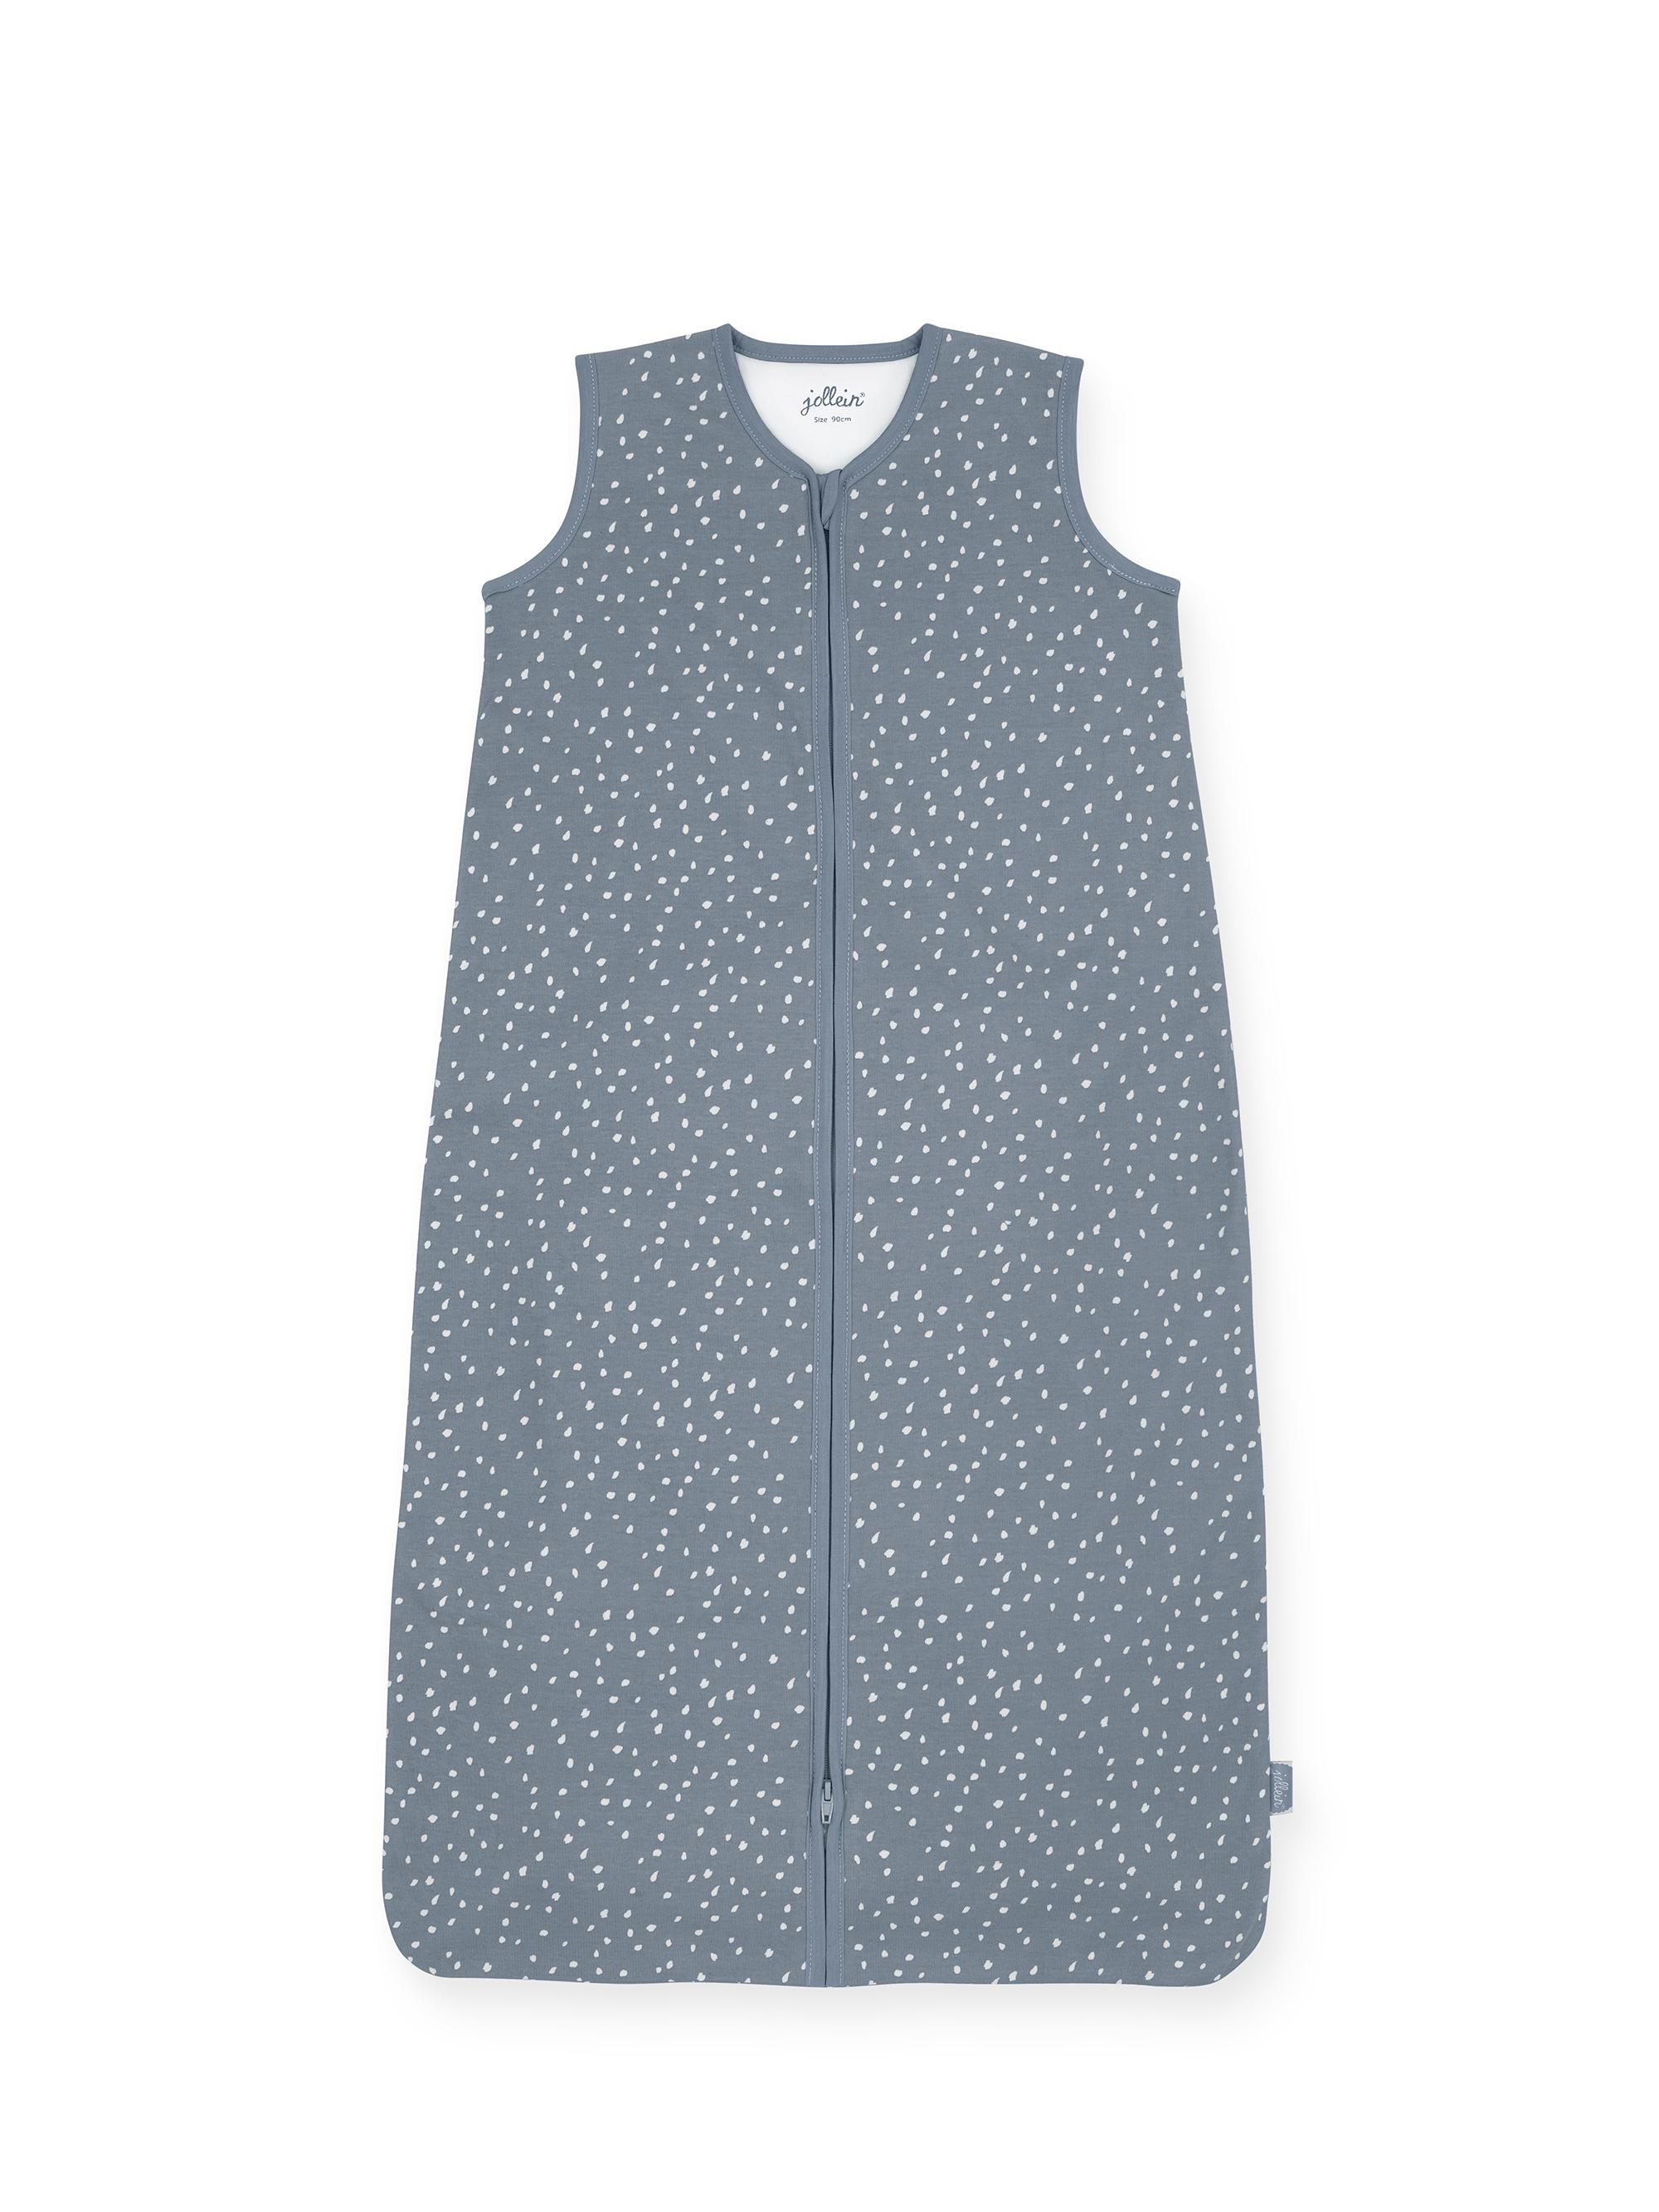 Sommerschlafsack Spickle storm grau (Gr. 110 cm)